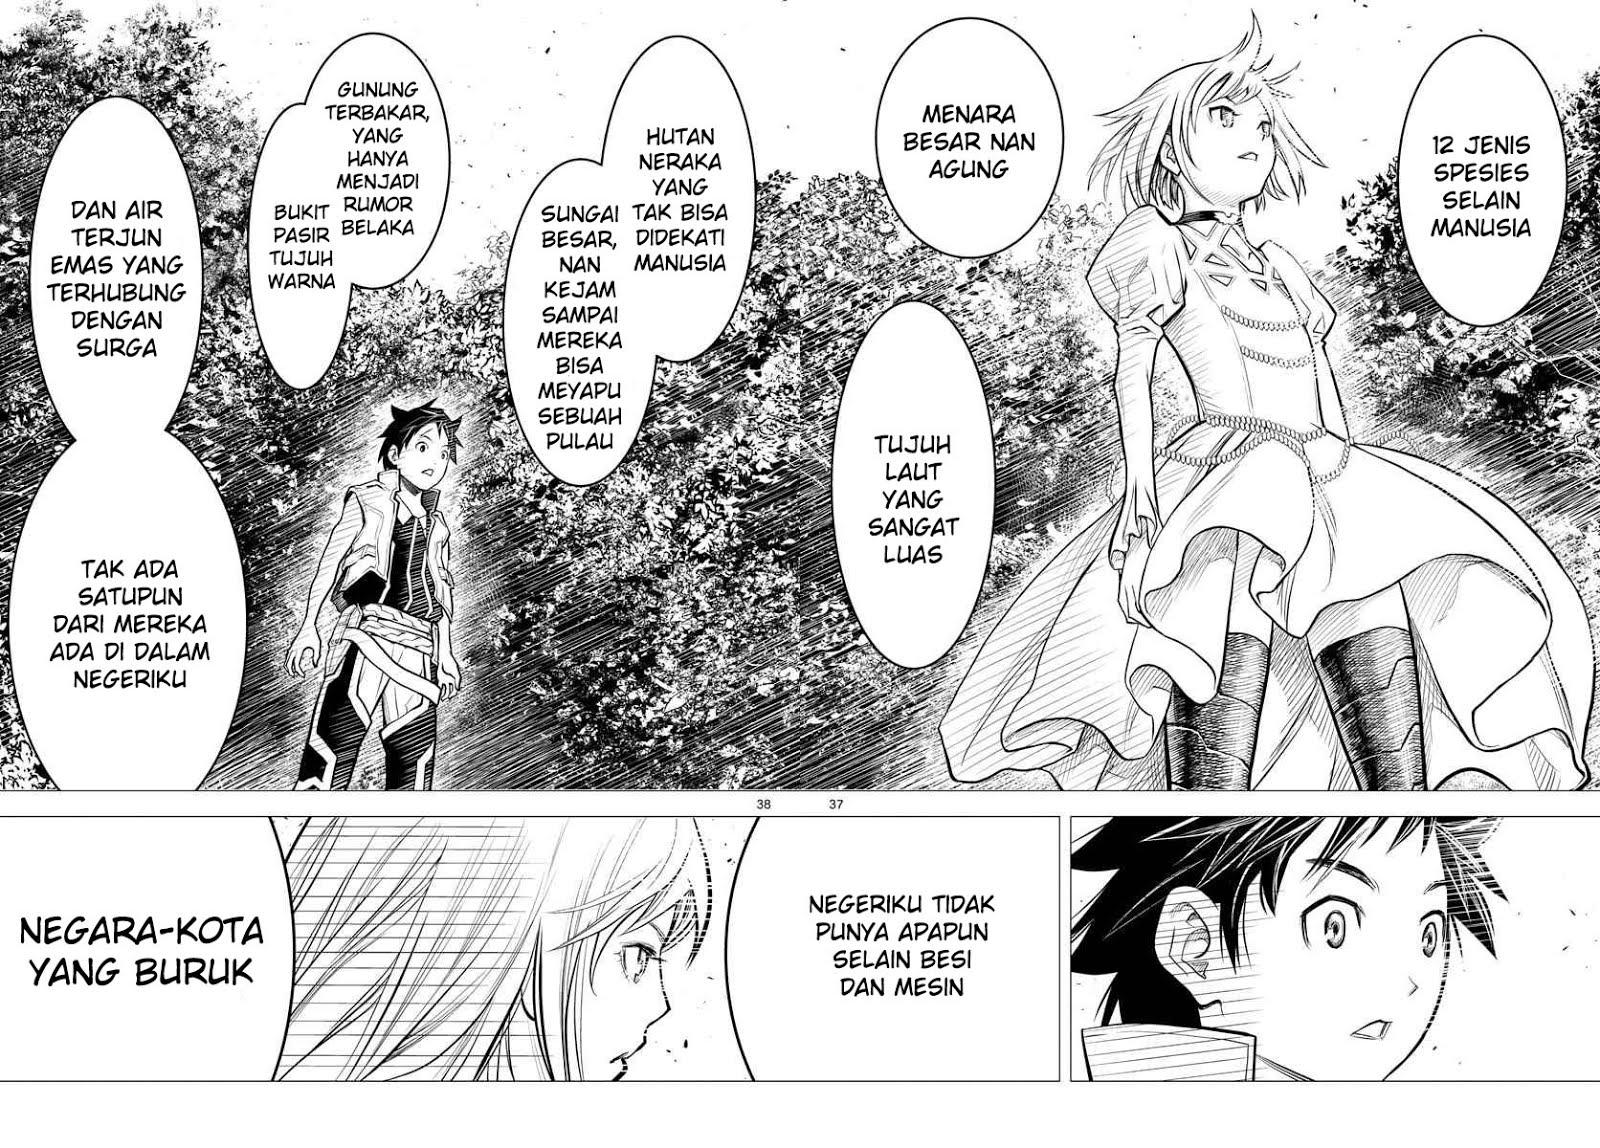 Komik soukyuu no ariadne 001 - chapter 1 2 Indonesia soukyuu no ariadne 001 - chapter 1 Terbaru 38|Baca Manga Komik Indonesia